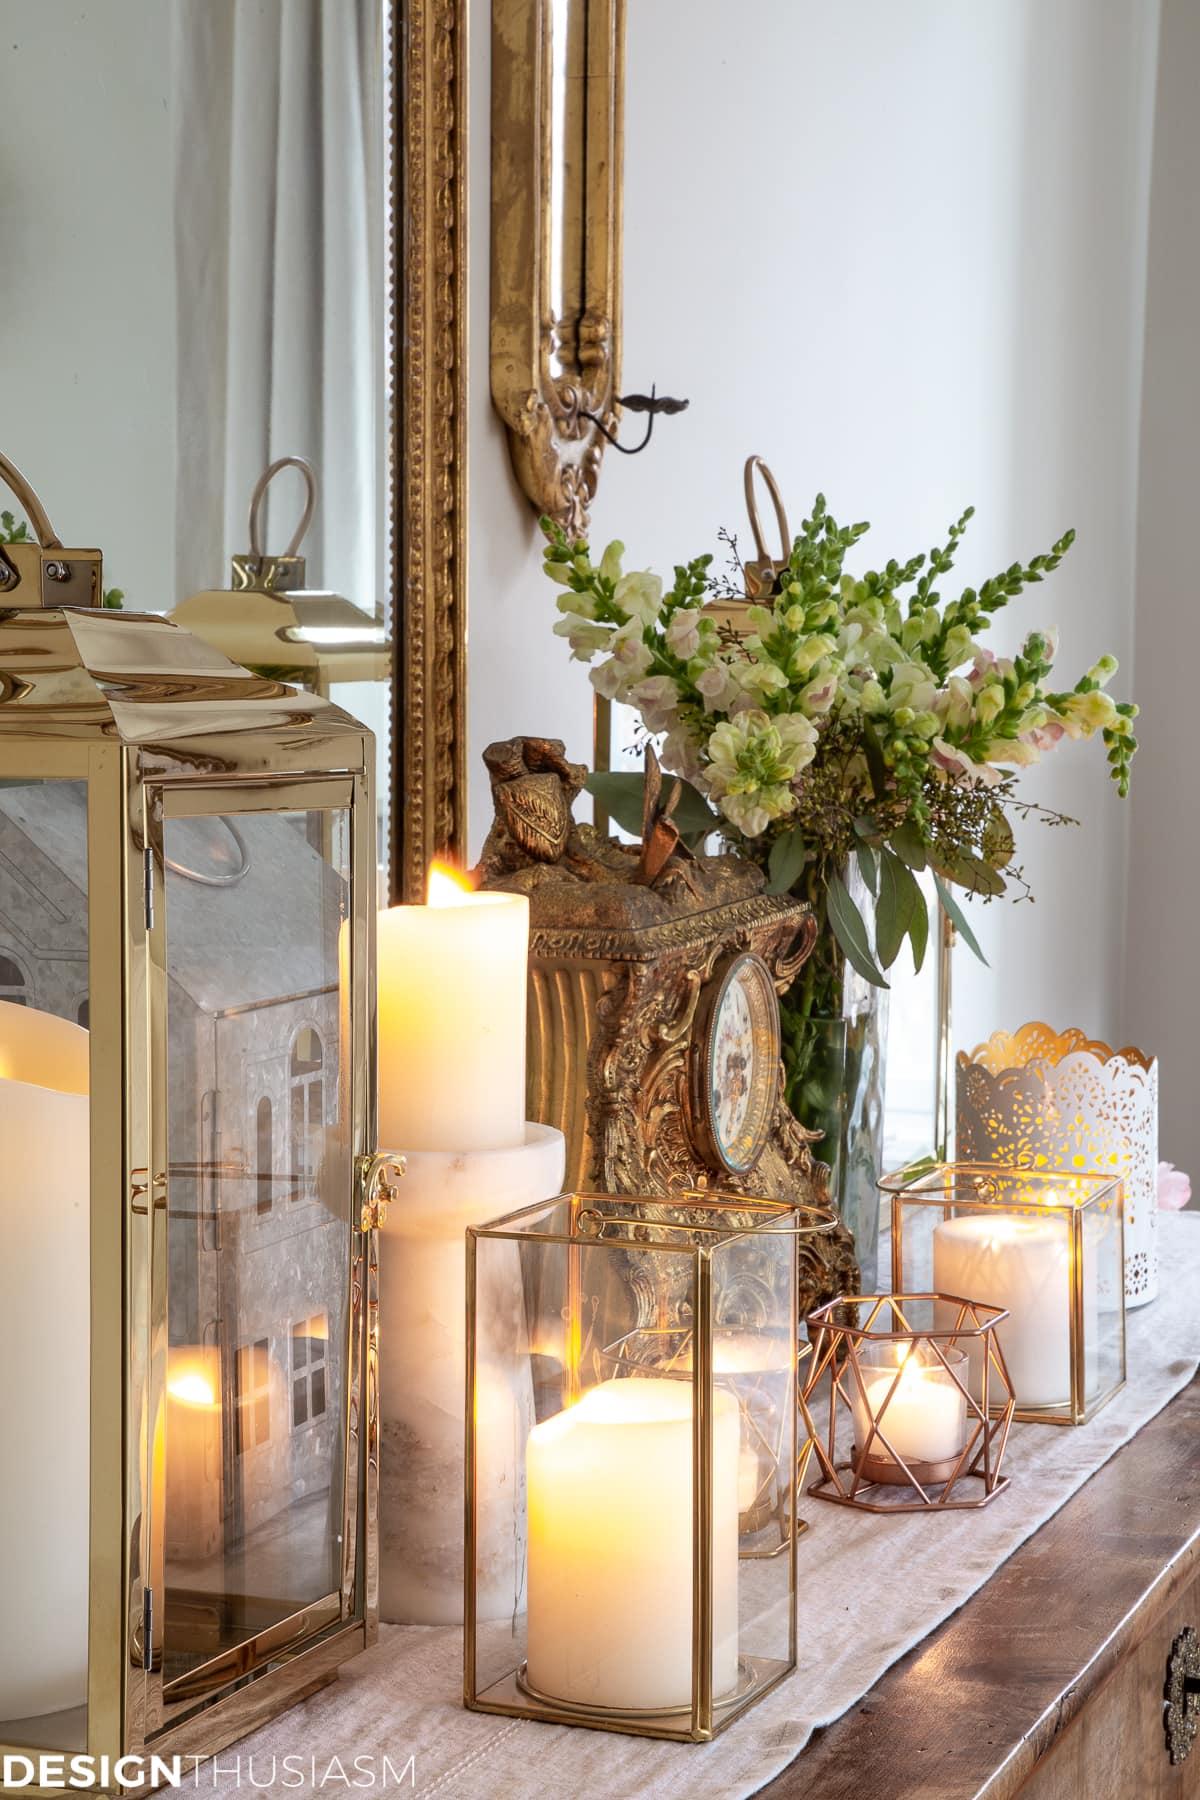 Home Style Saturdays 225 | Your Weekend Mini Lifestyle Magazine